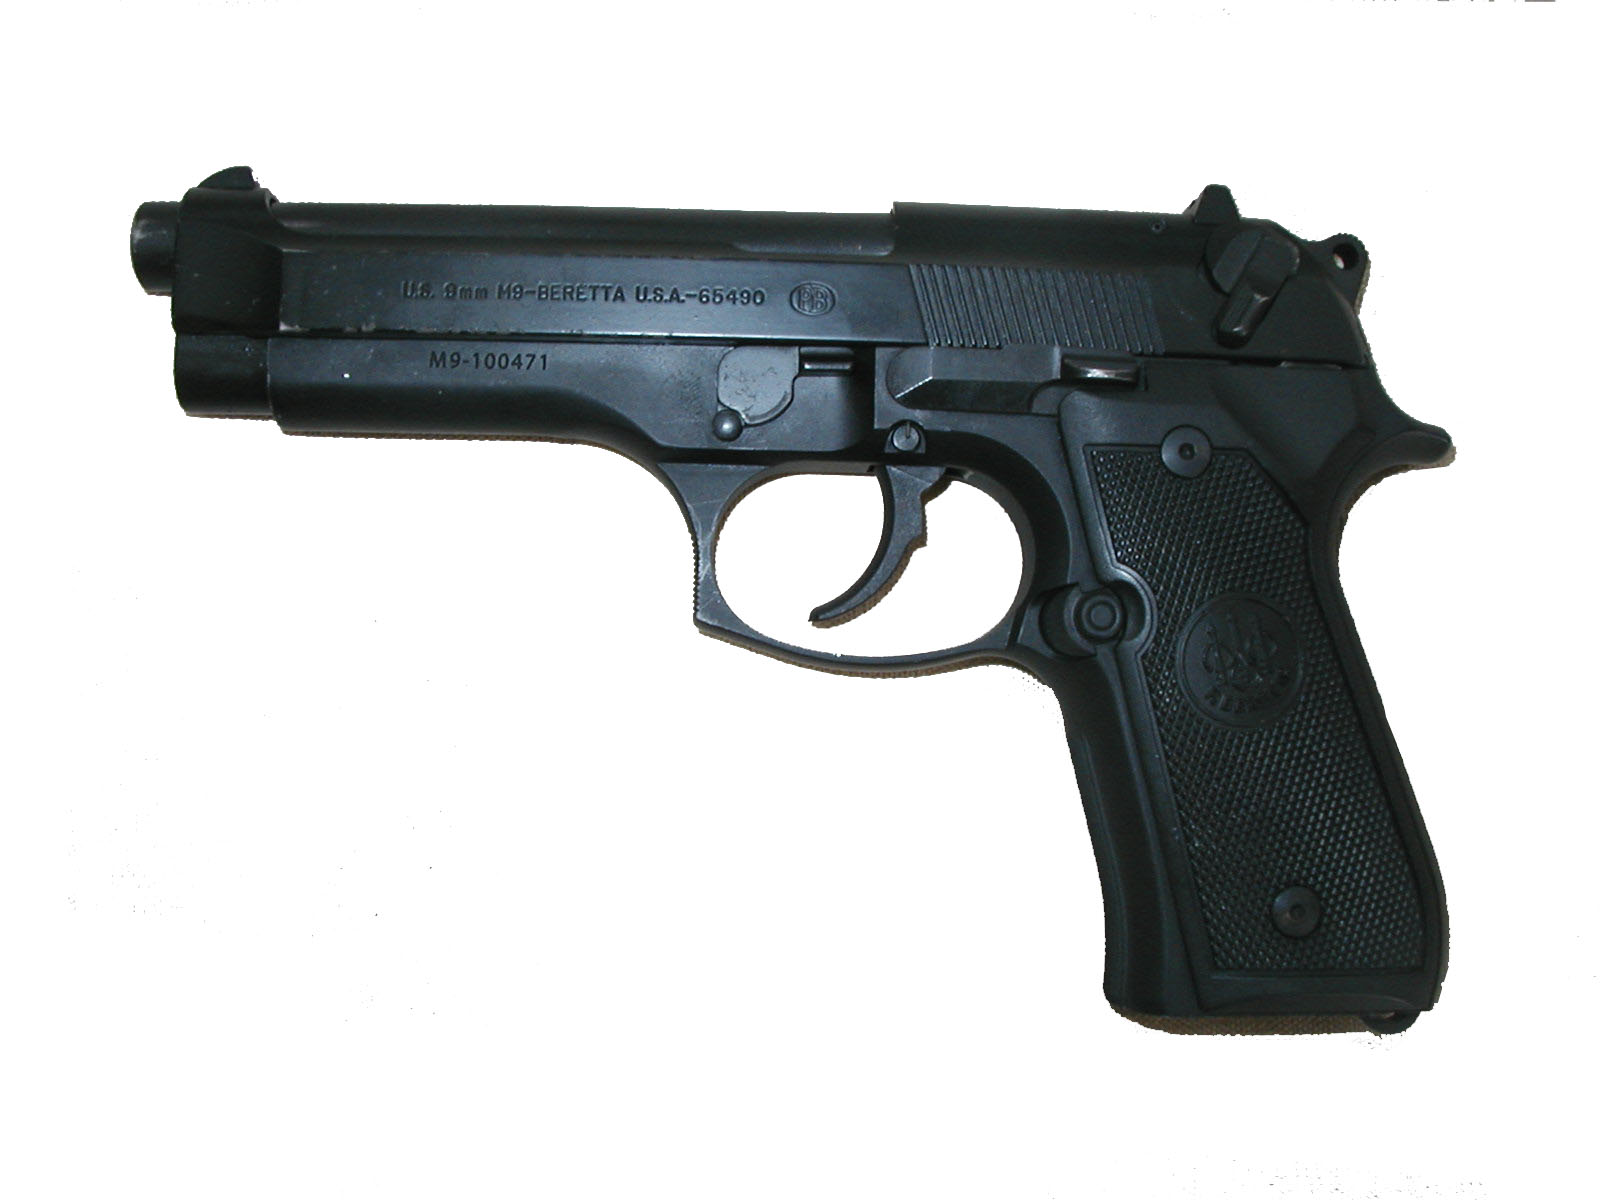 air soft mania community u s army rangers weapons 1